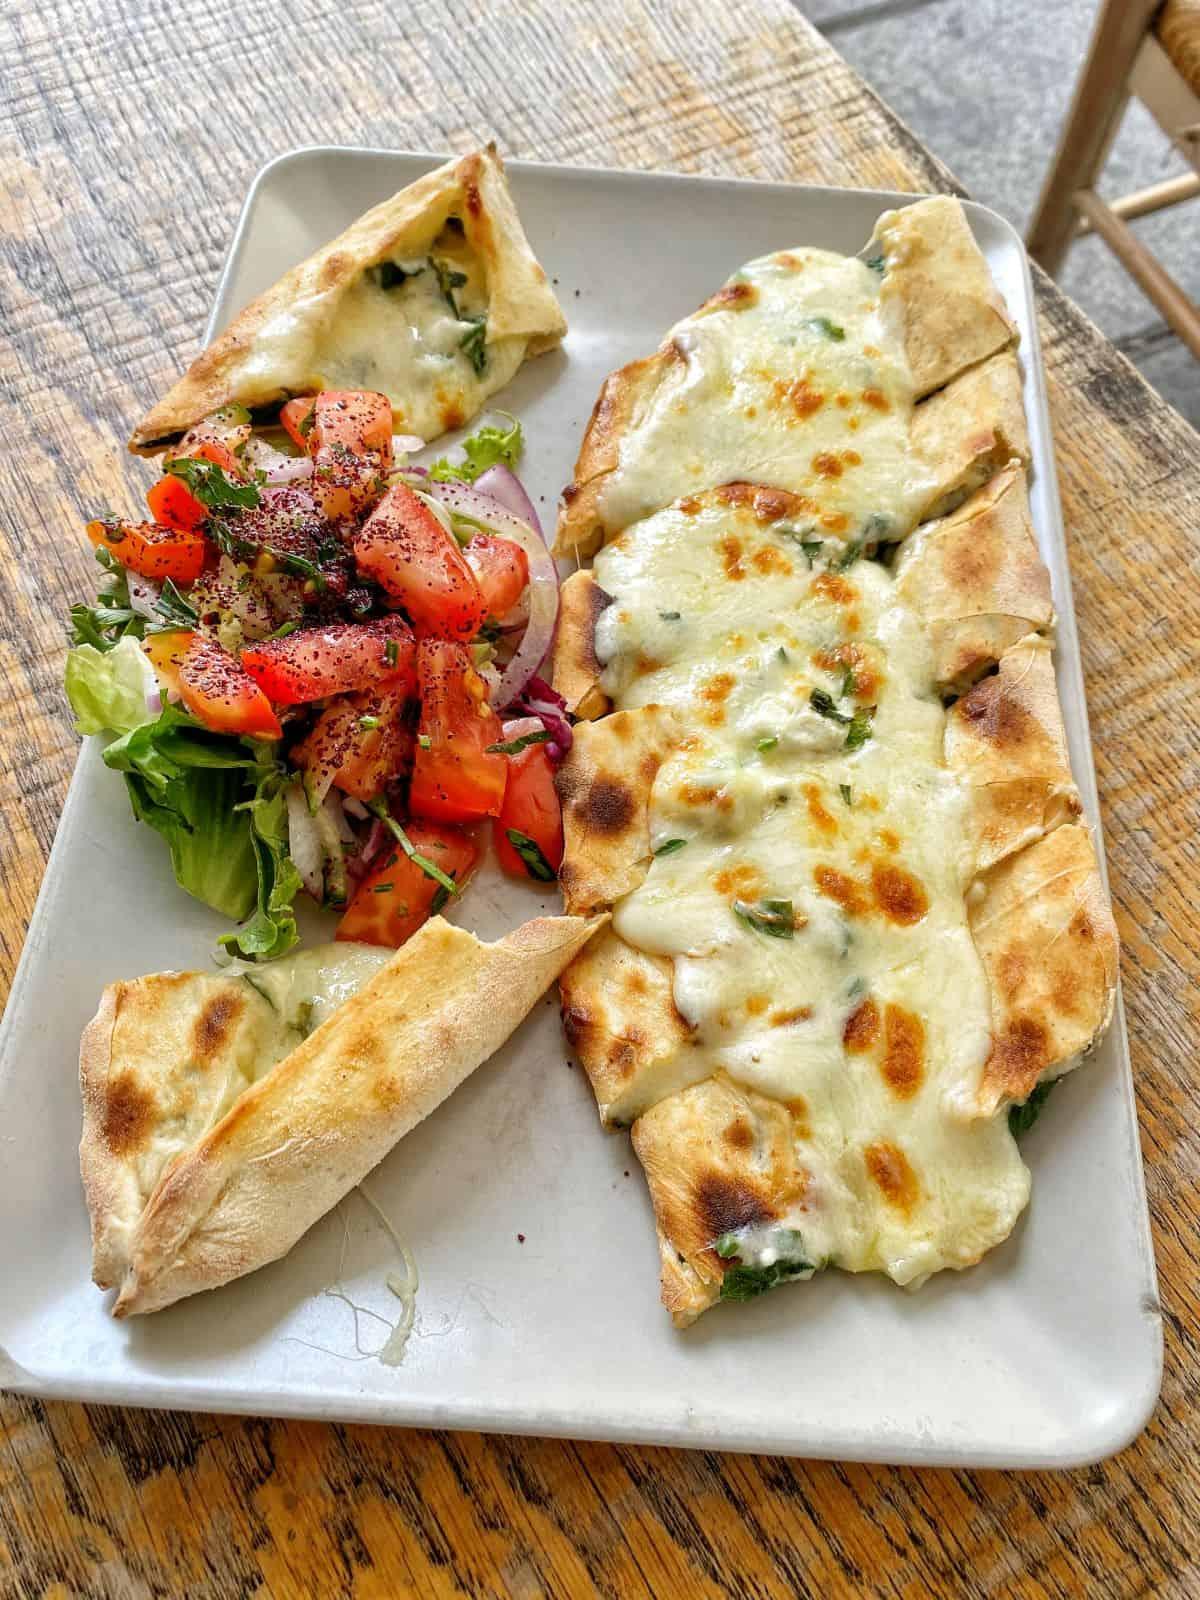 anatolia-village-restaurant-turque-paris-10e-lahmacun